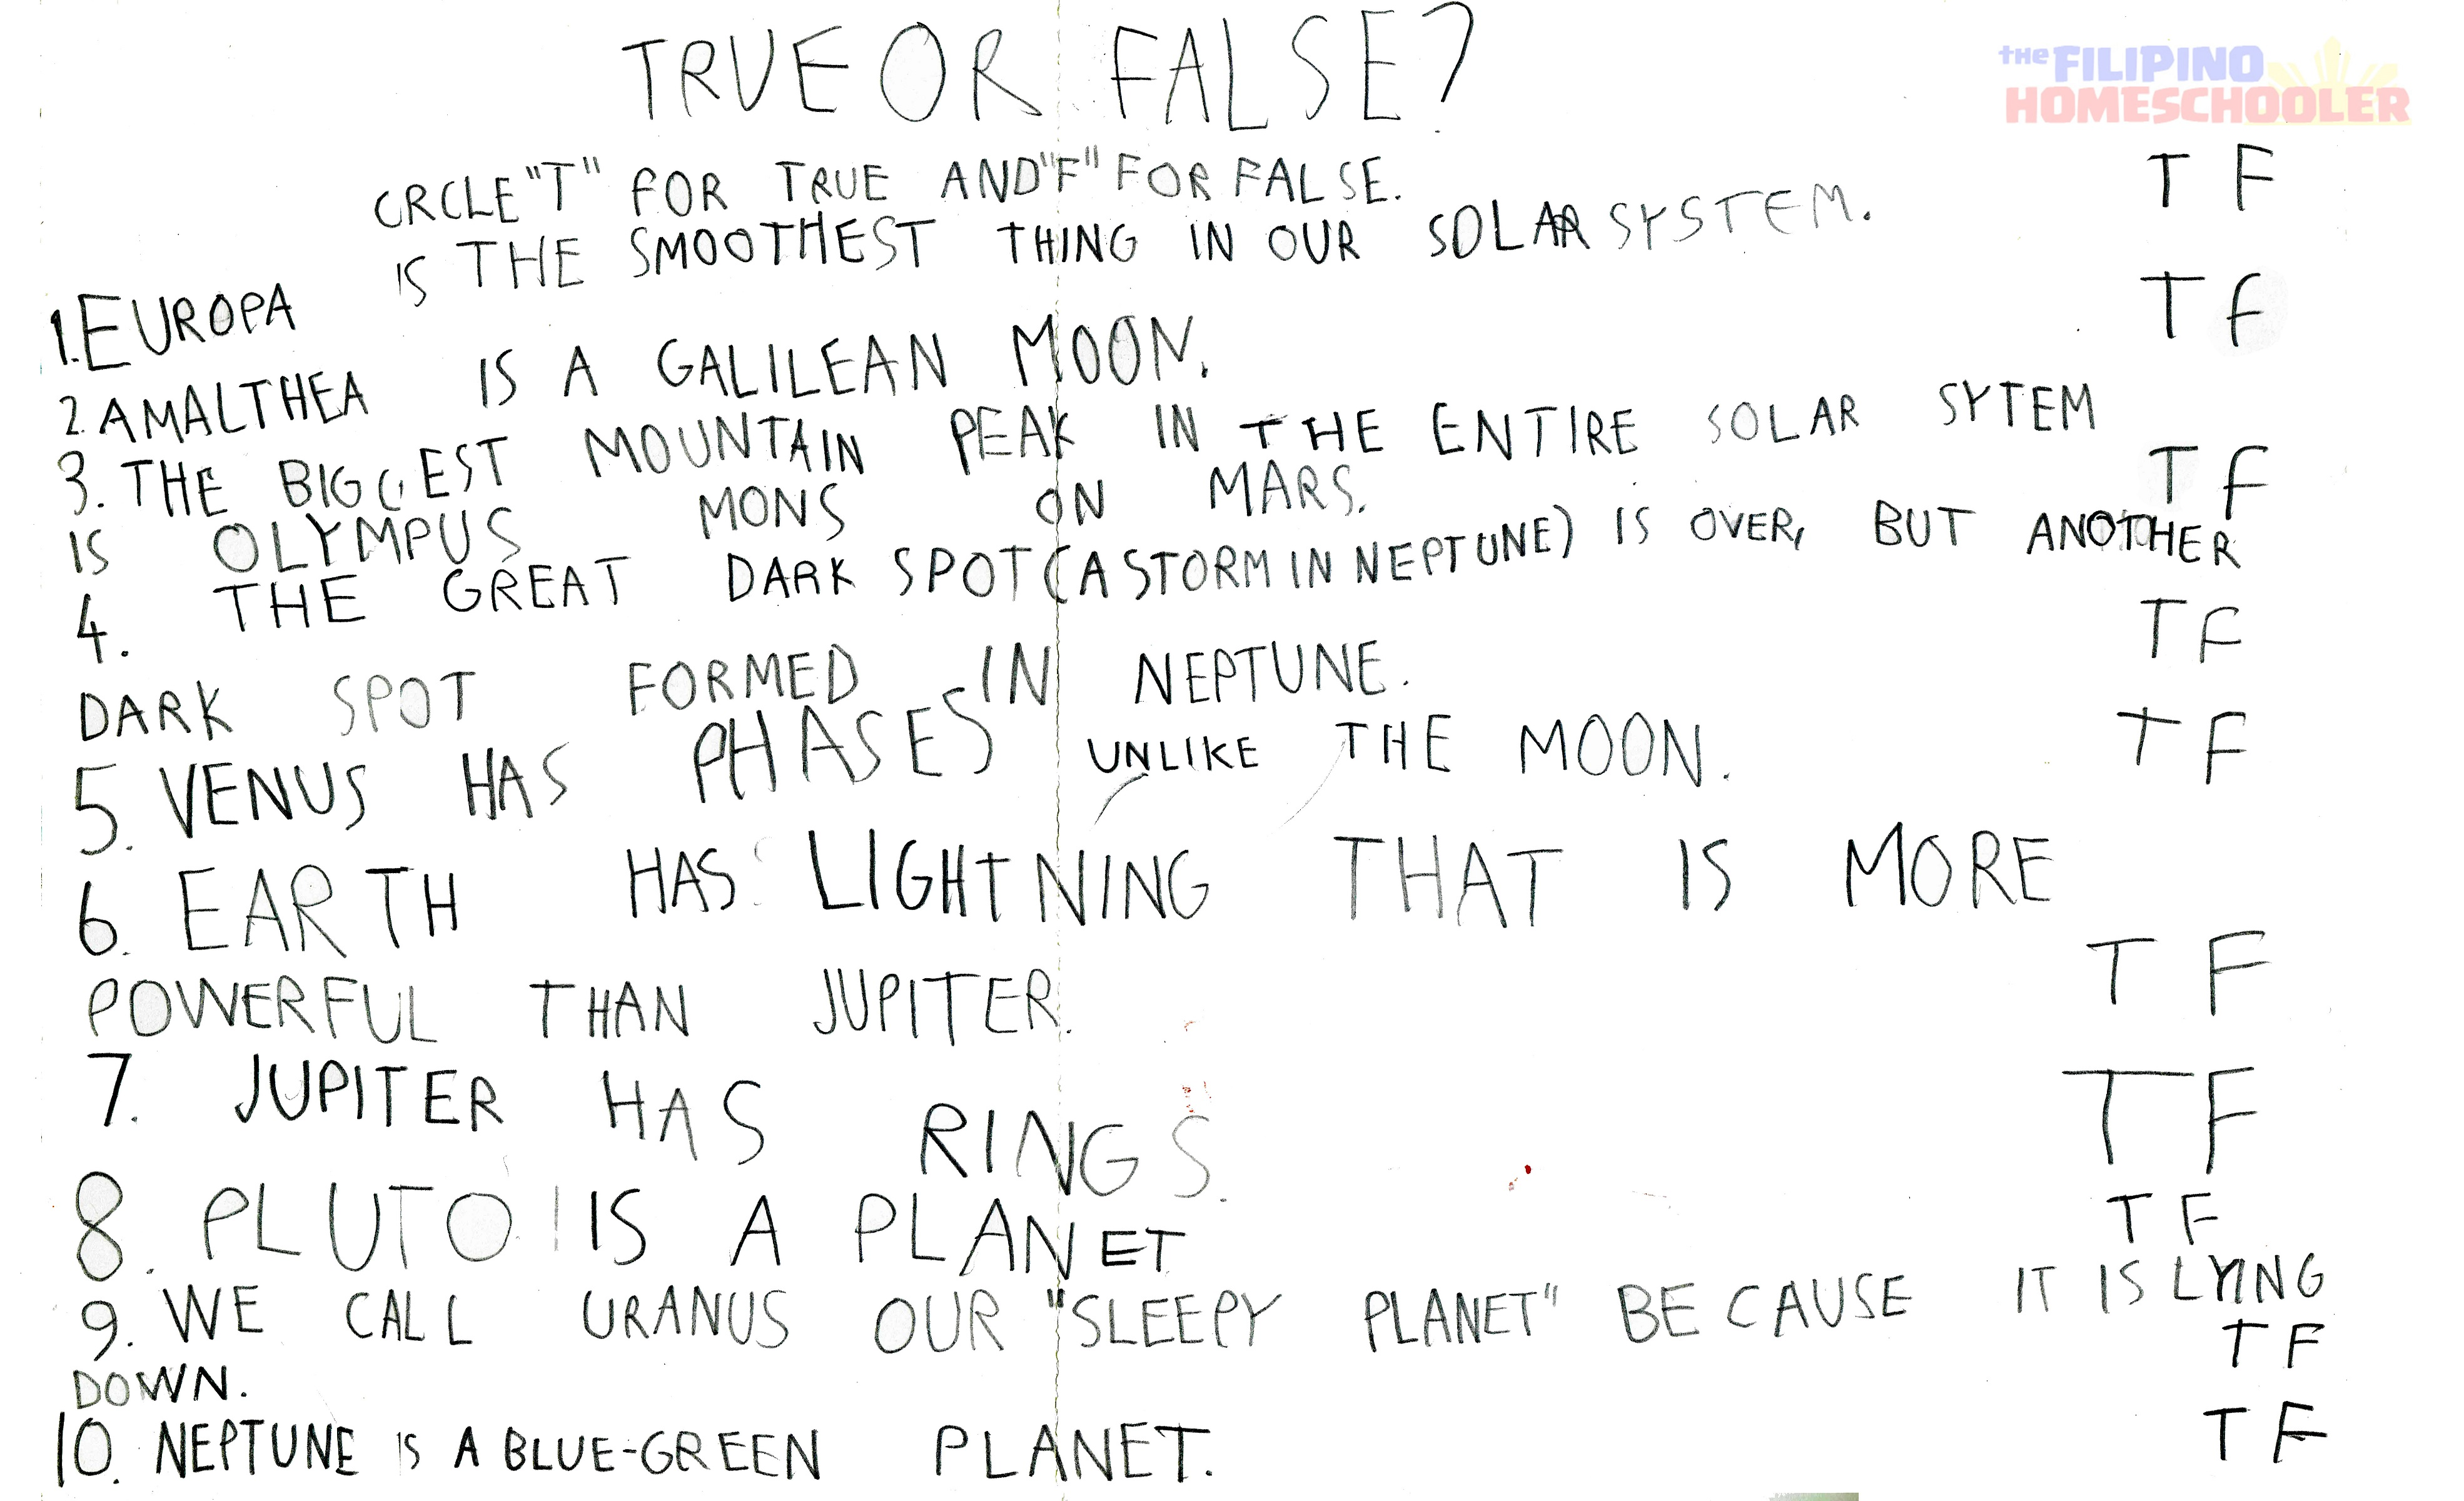 Gab S Grade 1 Astronomy Worksheet The Filipino Homeschooler